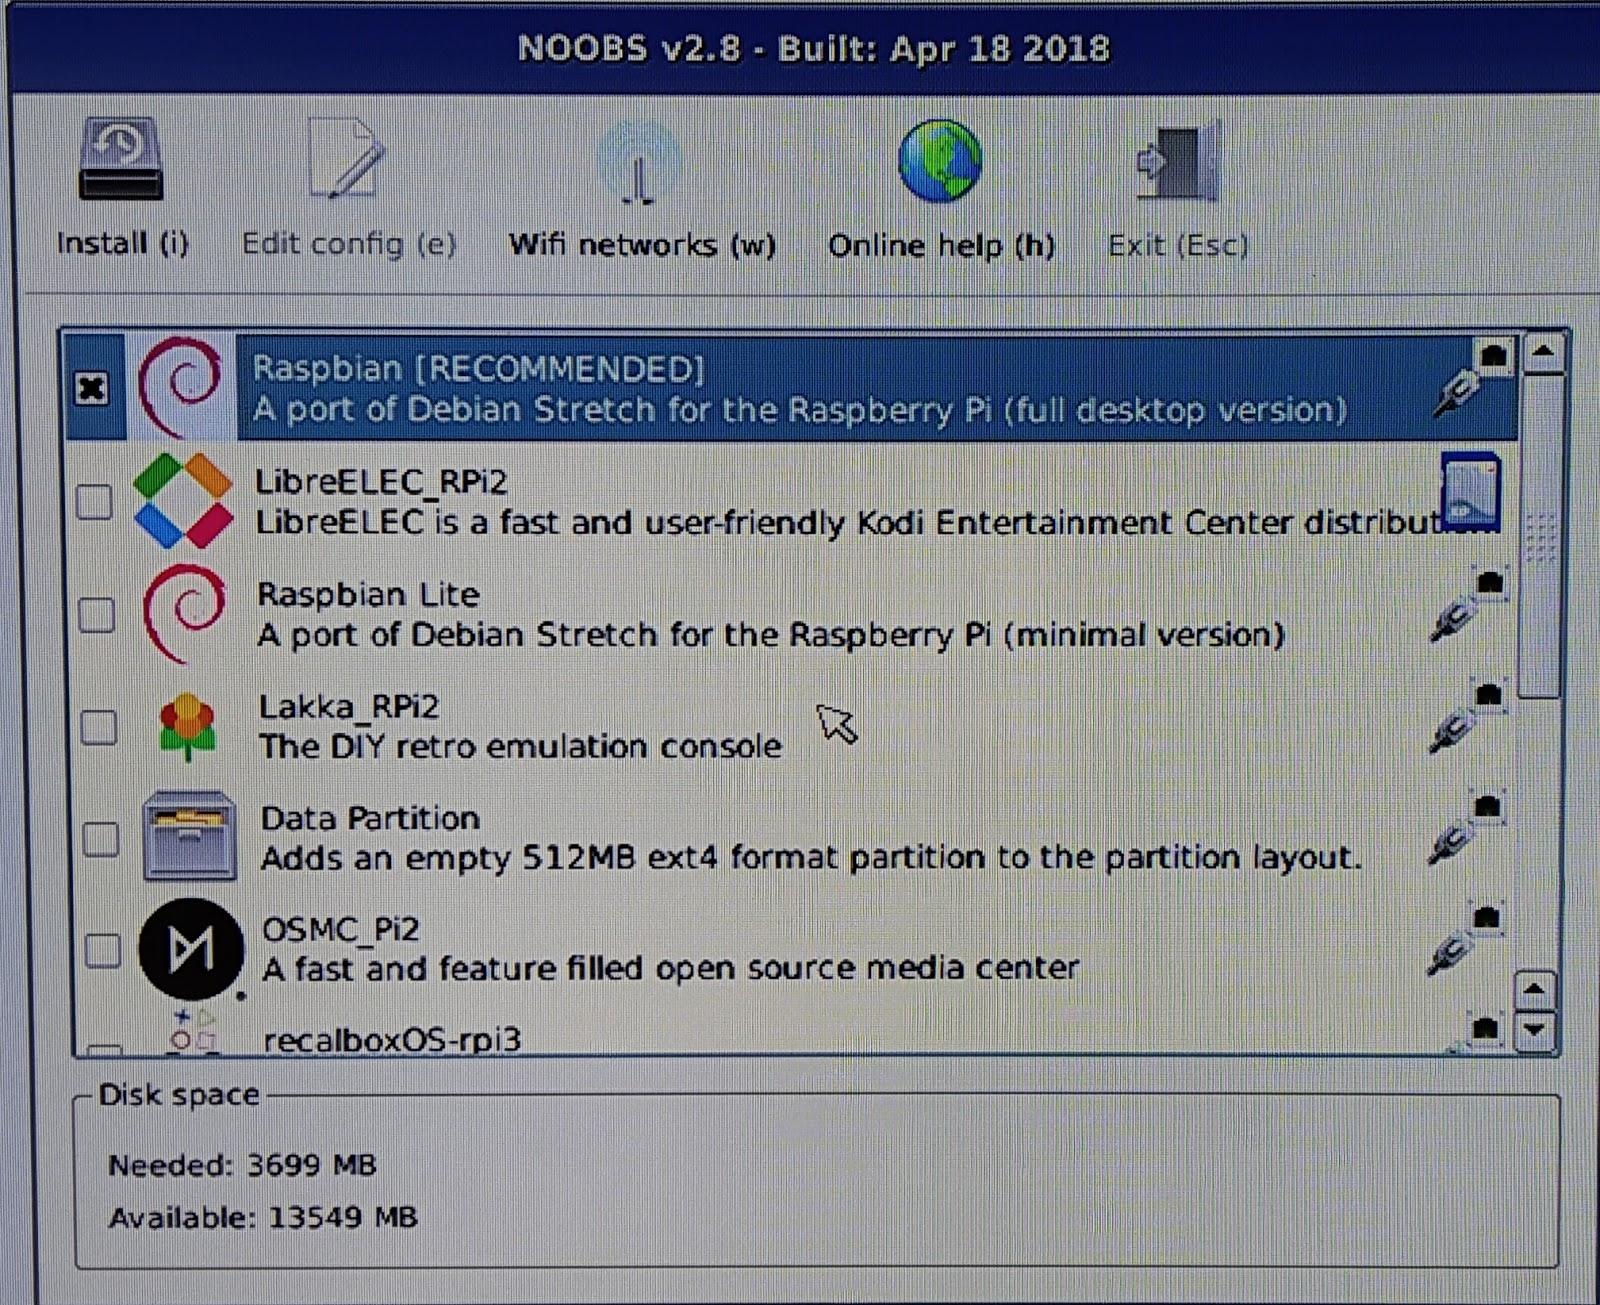 MICROPROCESSOR AND MICROCONTROLLER: Raspberry Pi - Setup